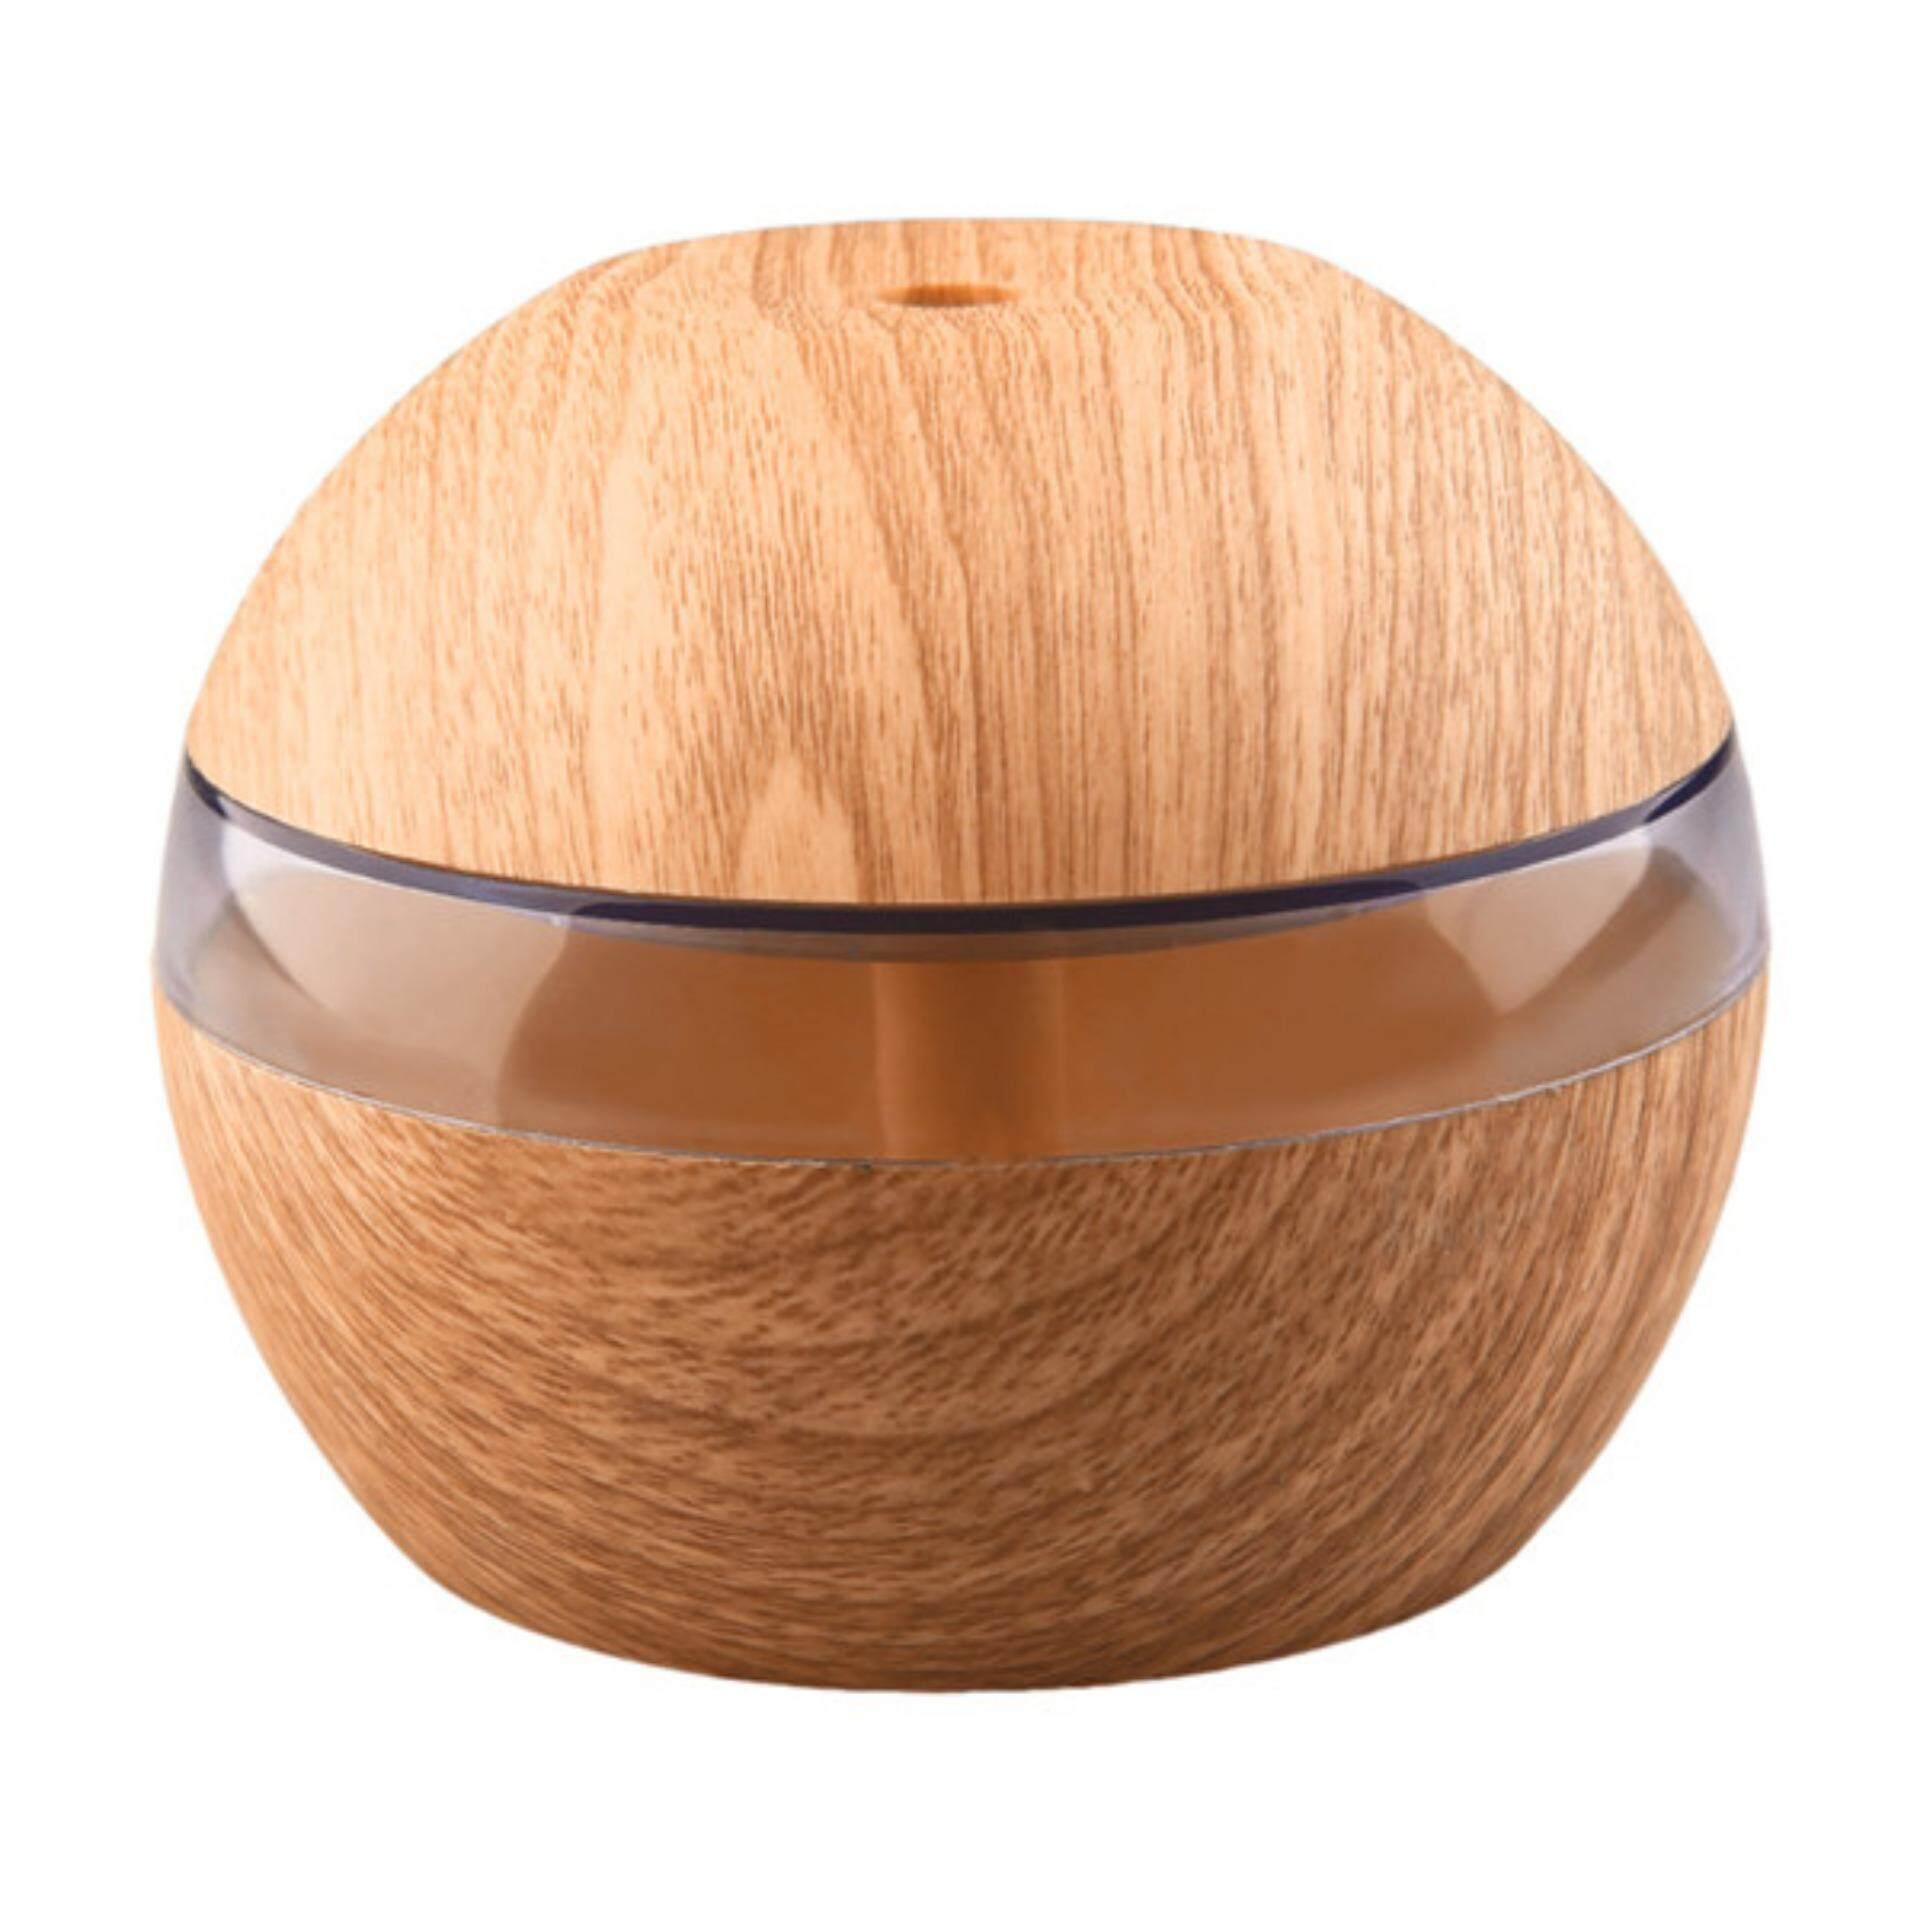 Mini Portable Mist Maker Aroma Essential Oil Diffuser Ultrasonic Aroma Humidifier Light Wooden USB Diffuser